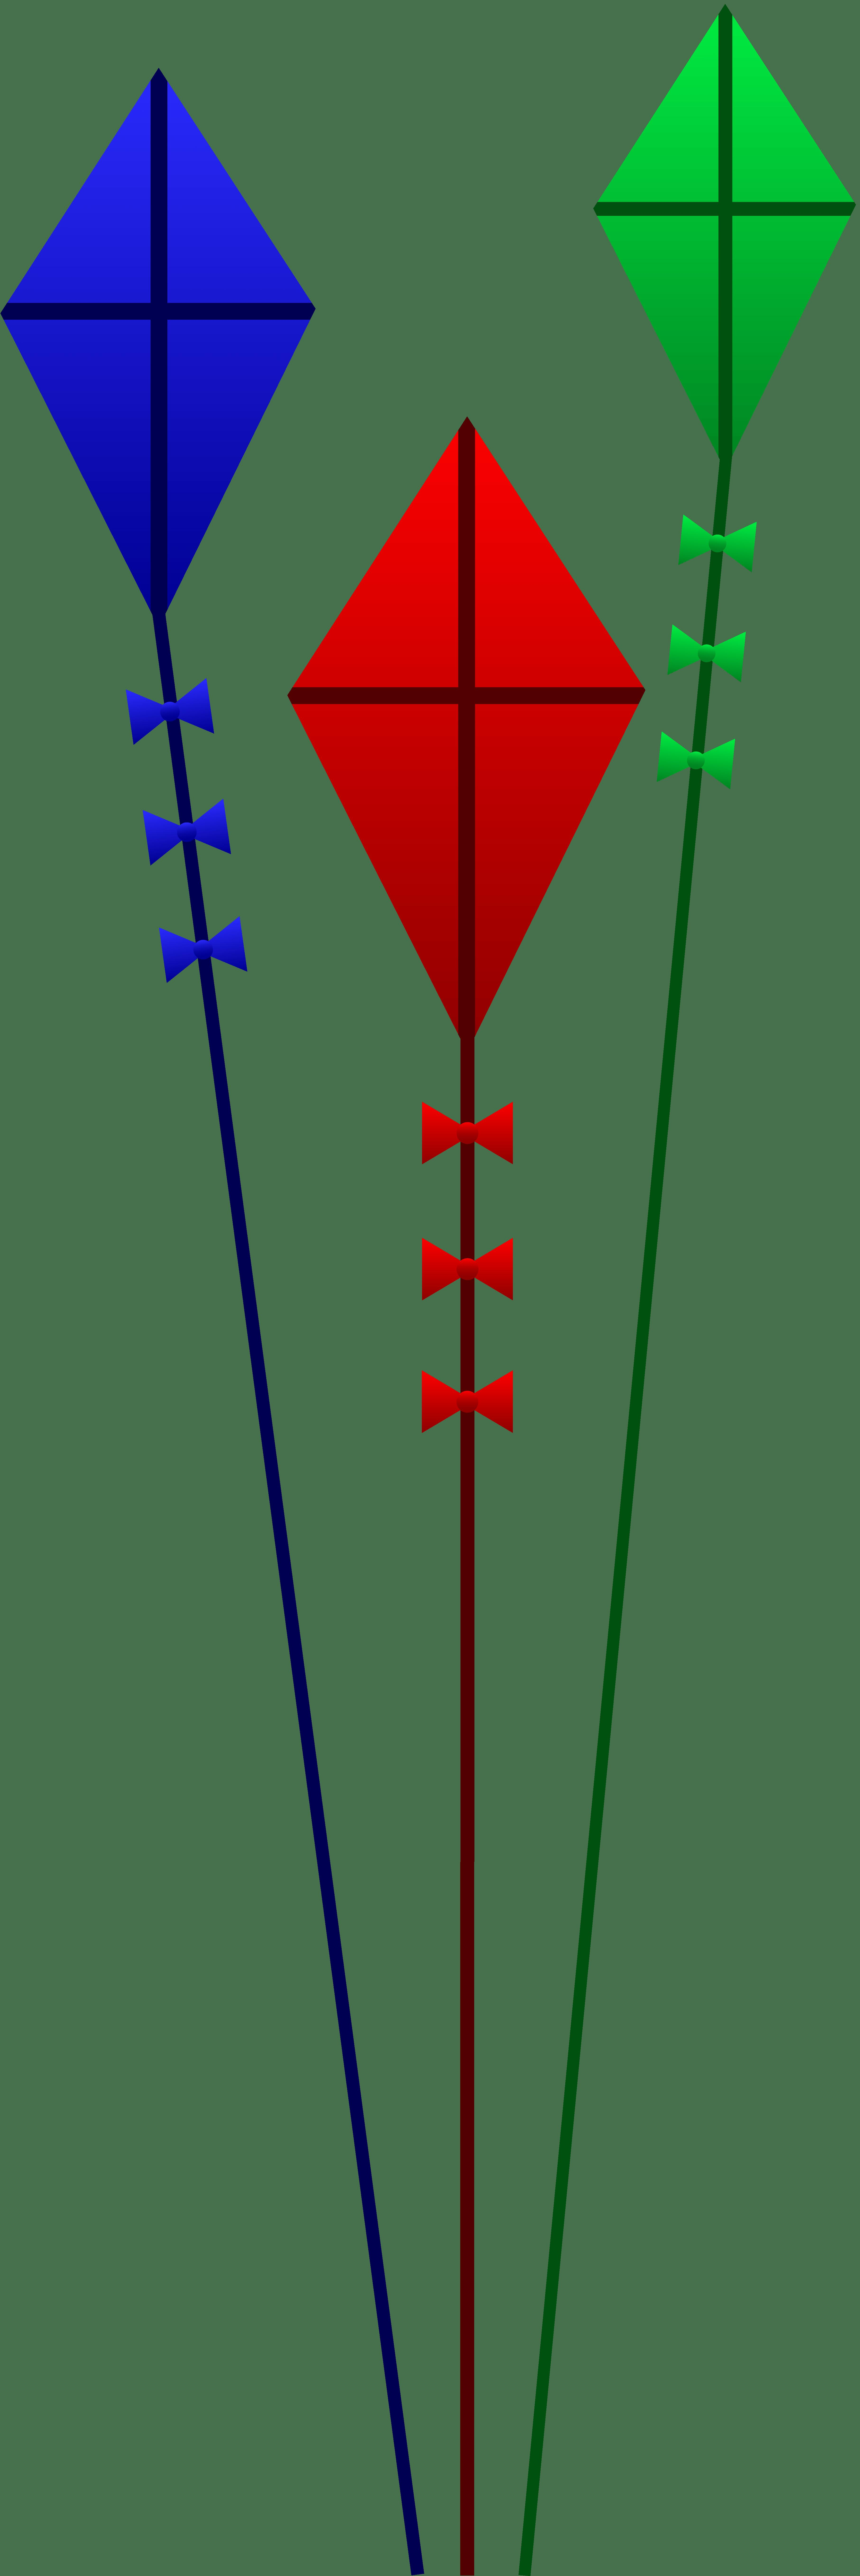 Kite Clipart